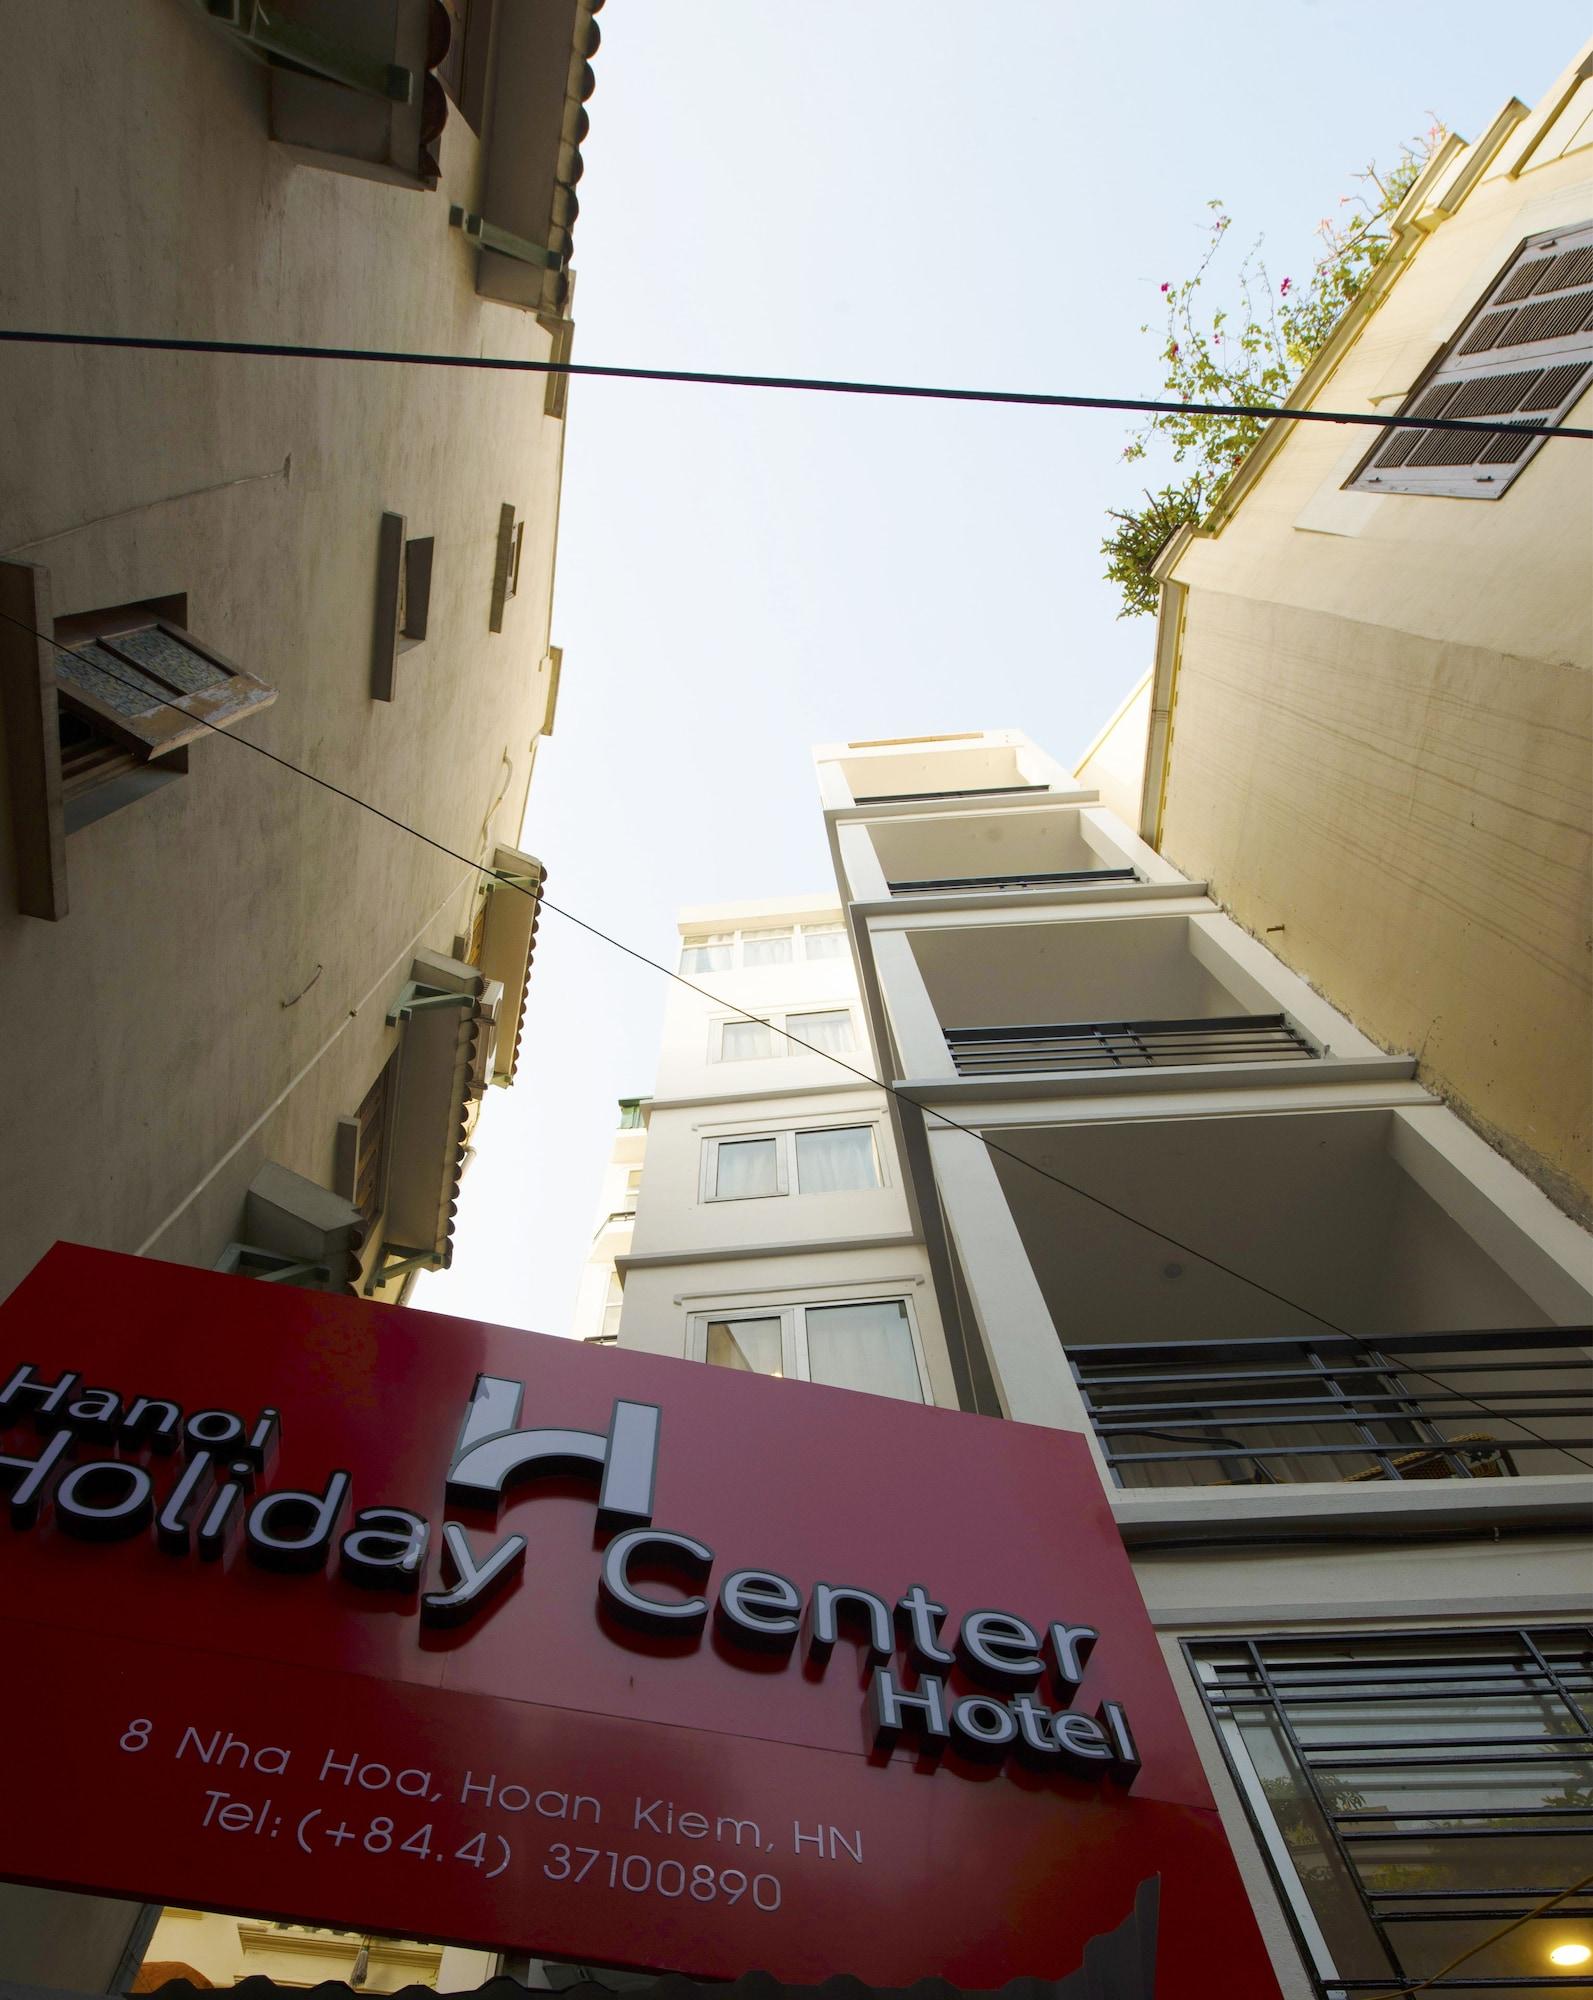 Hanoi Holiday Center Hotel, Hoàn Kiếm